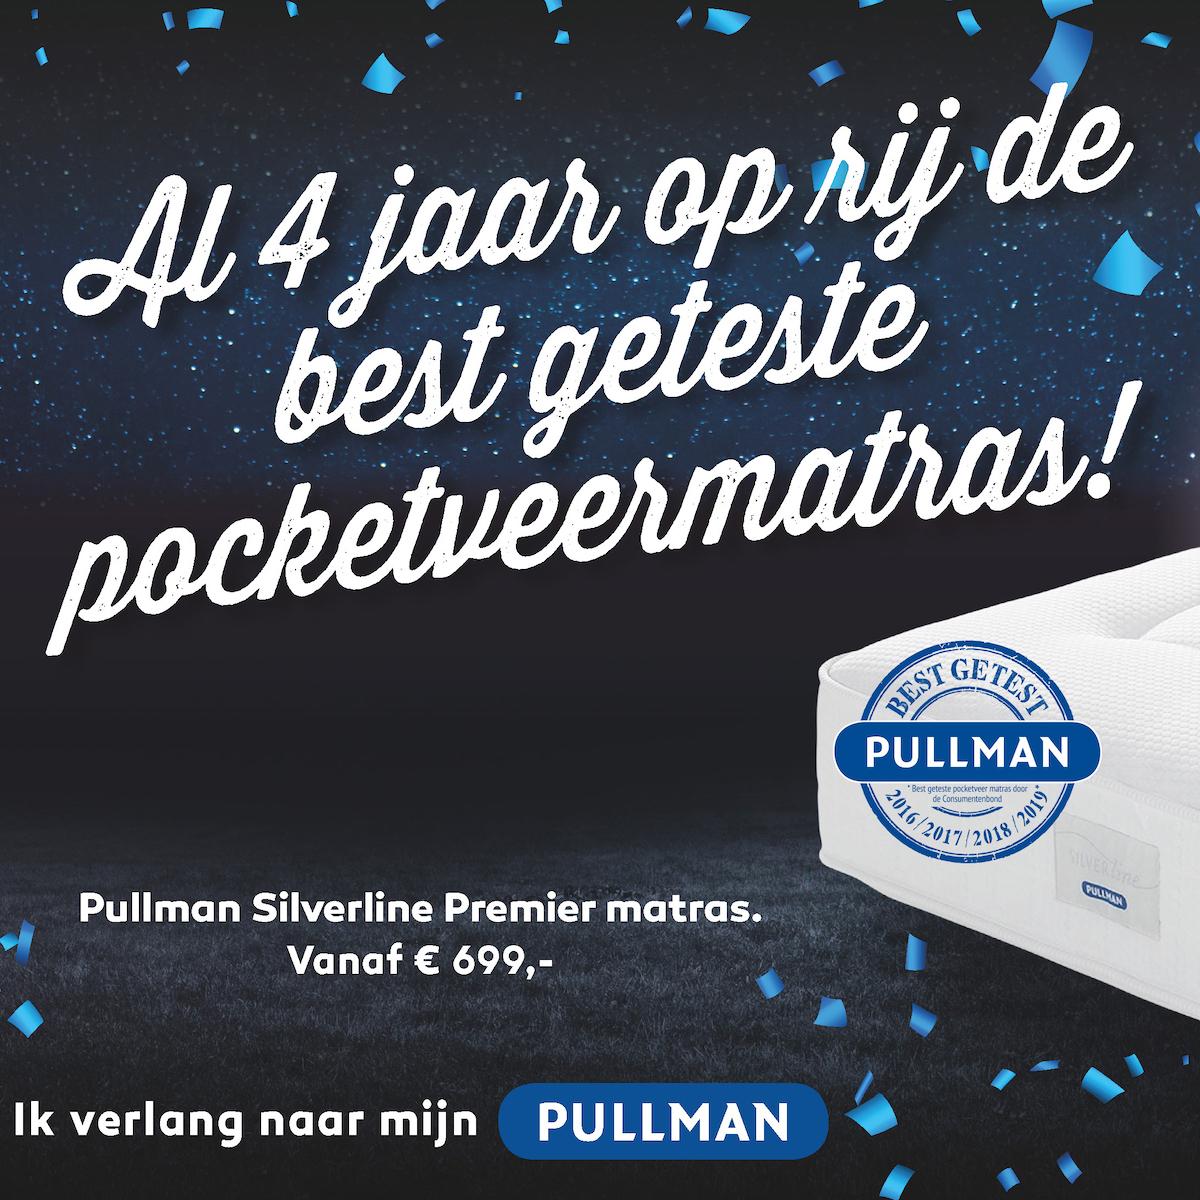 Pullman_Silverline_Beste Getest_2019_Social Media